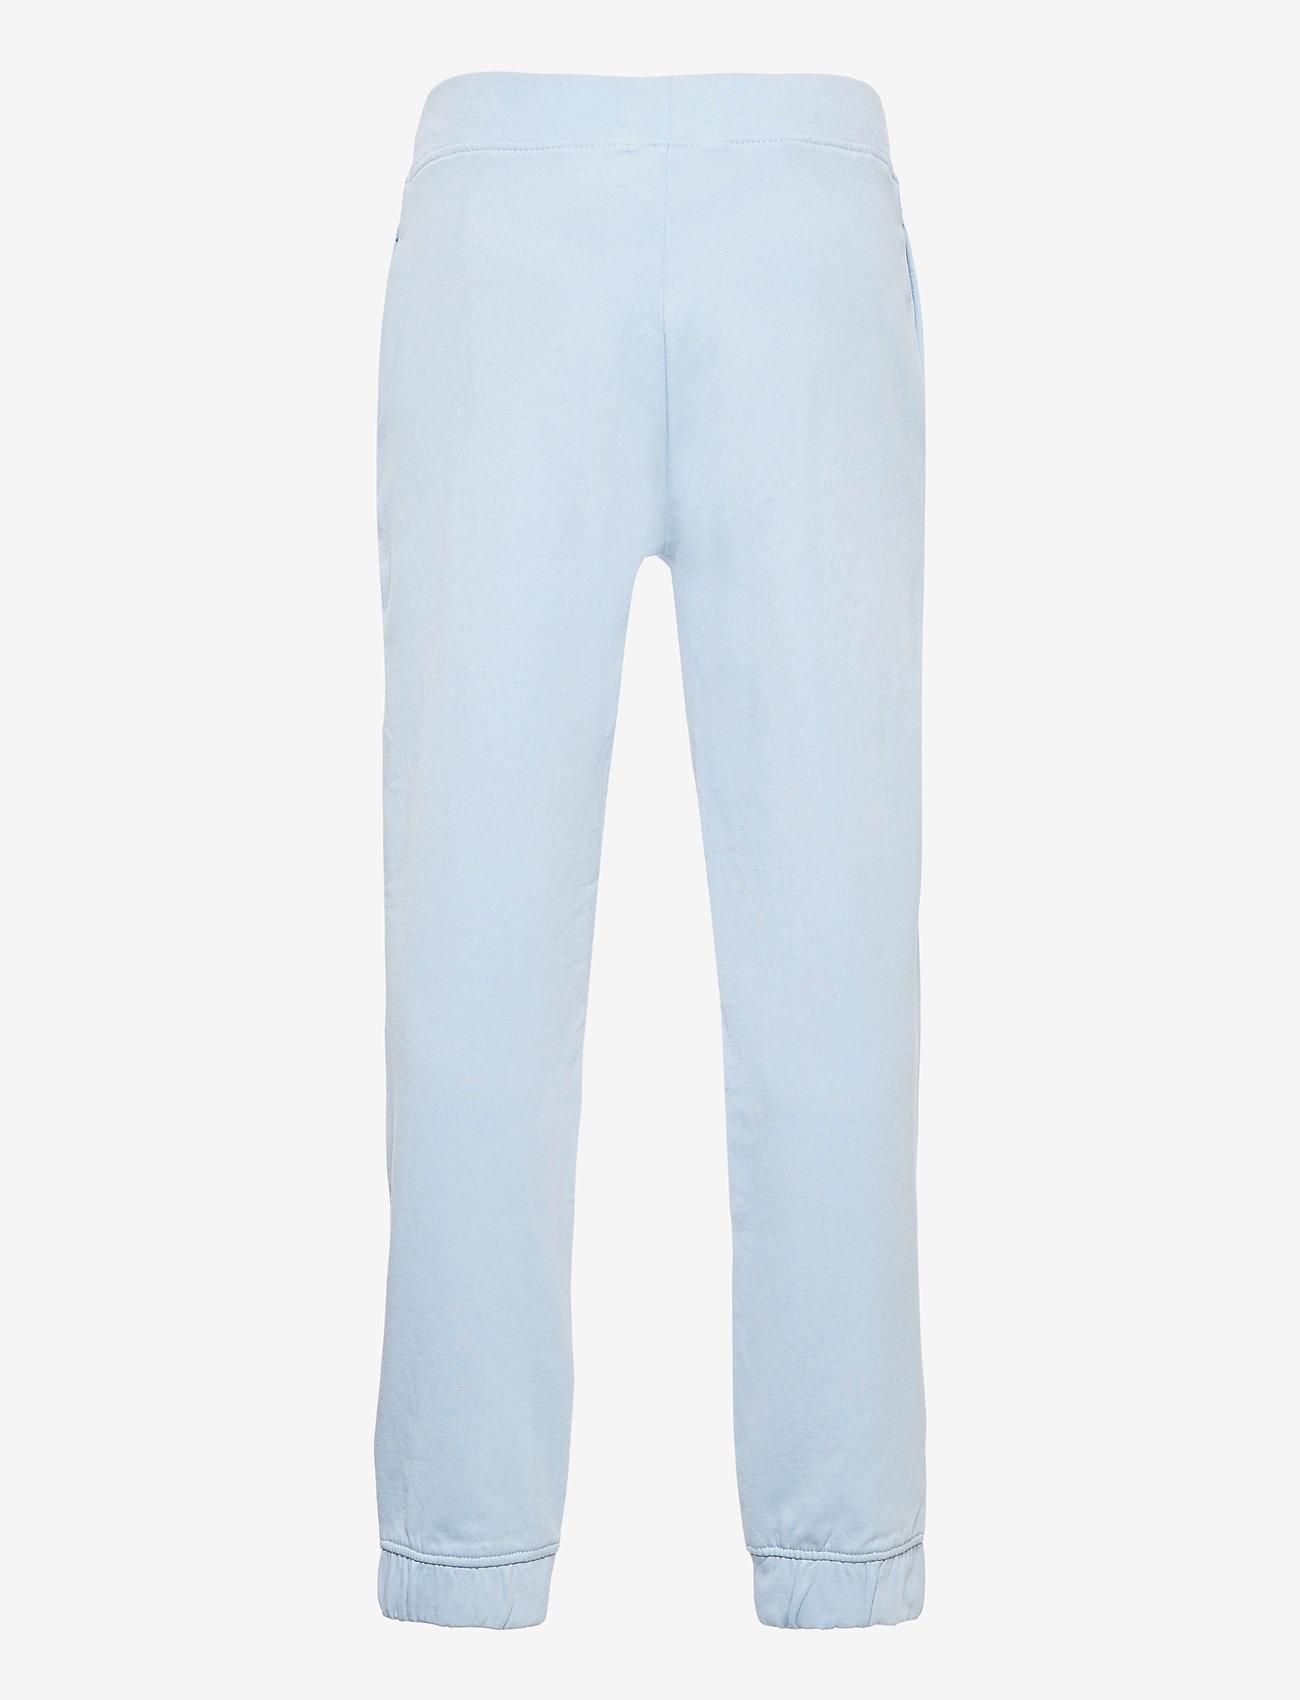 name it - NKFHOWAY SWEAT PANT  BRU - jogginghosen - dusty blue - 1